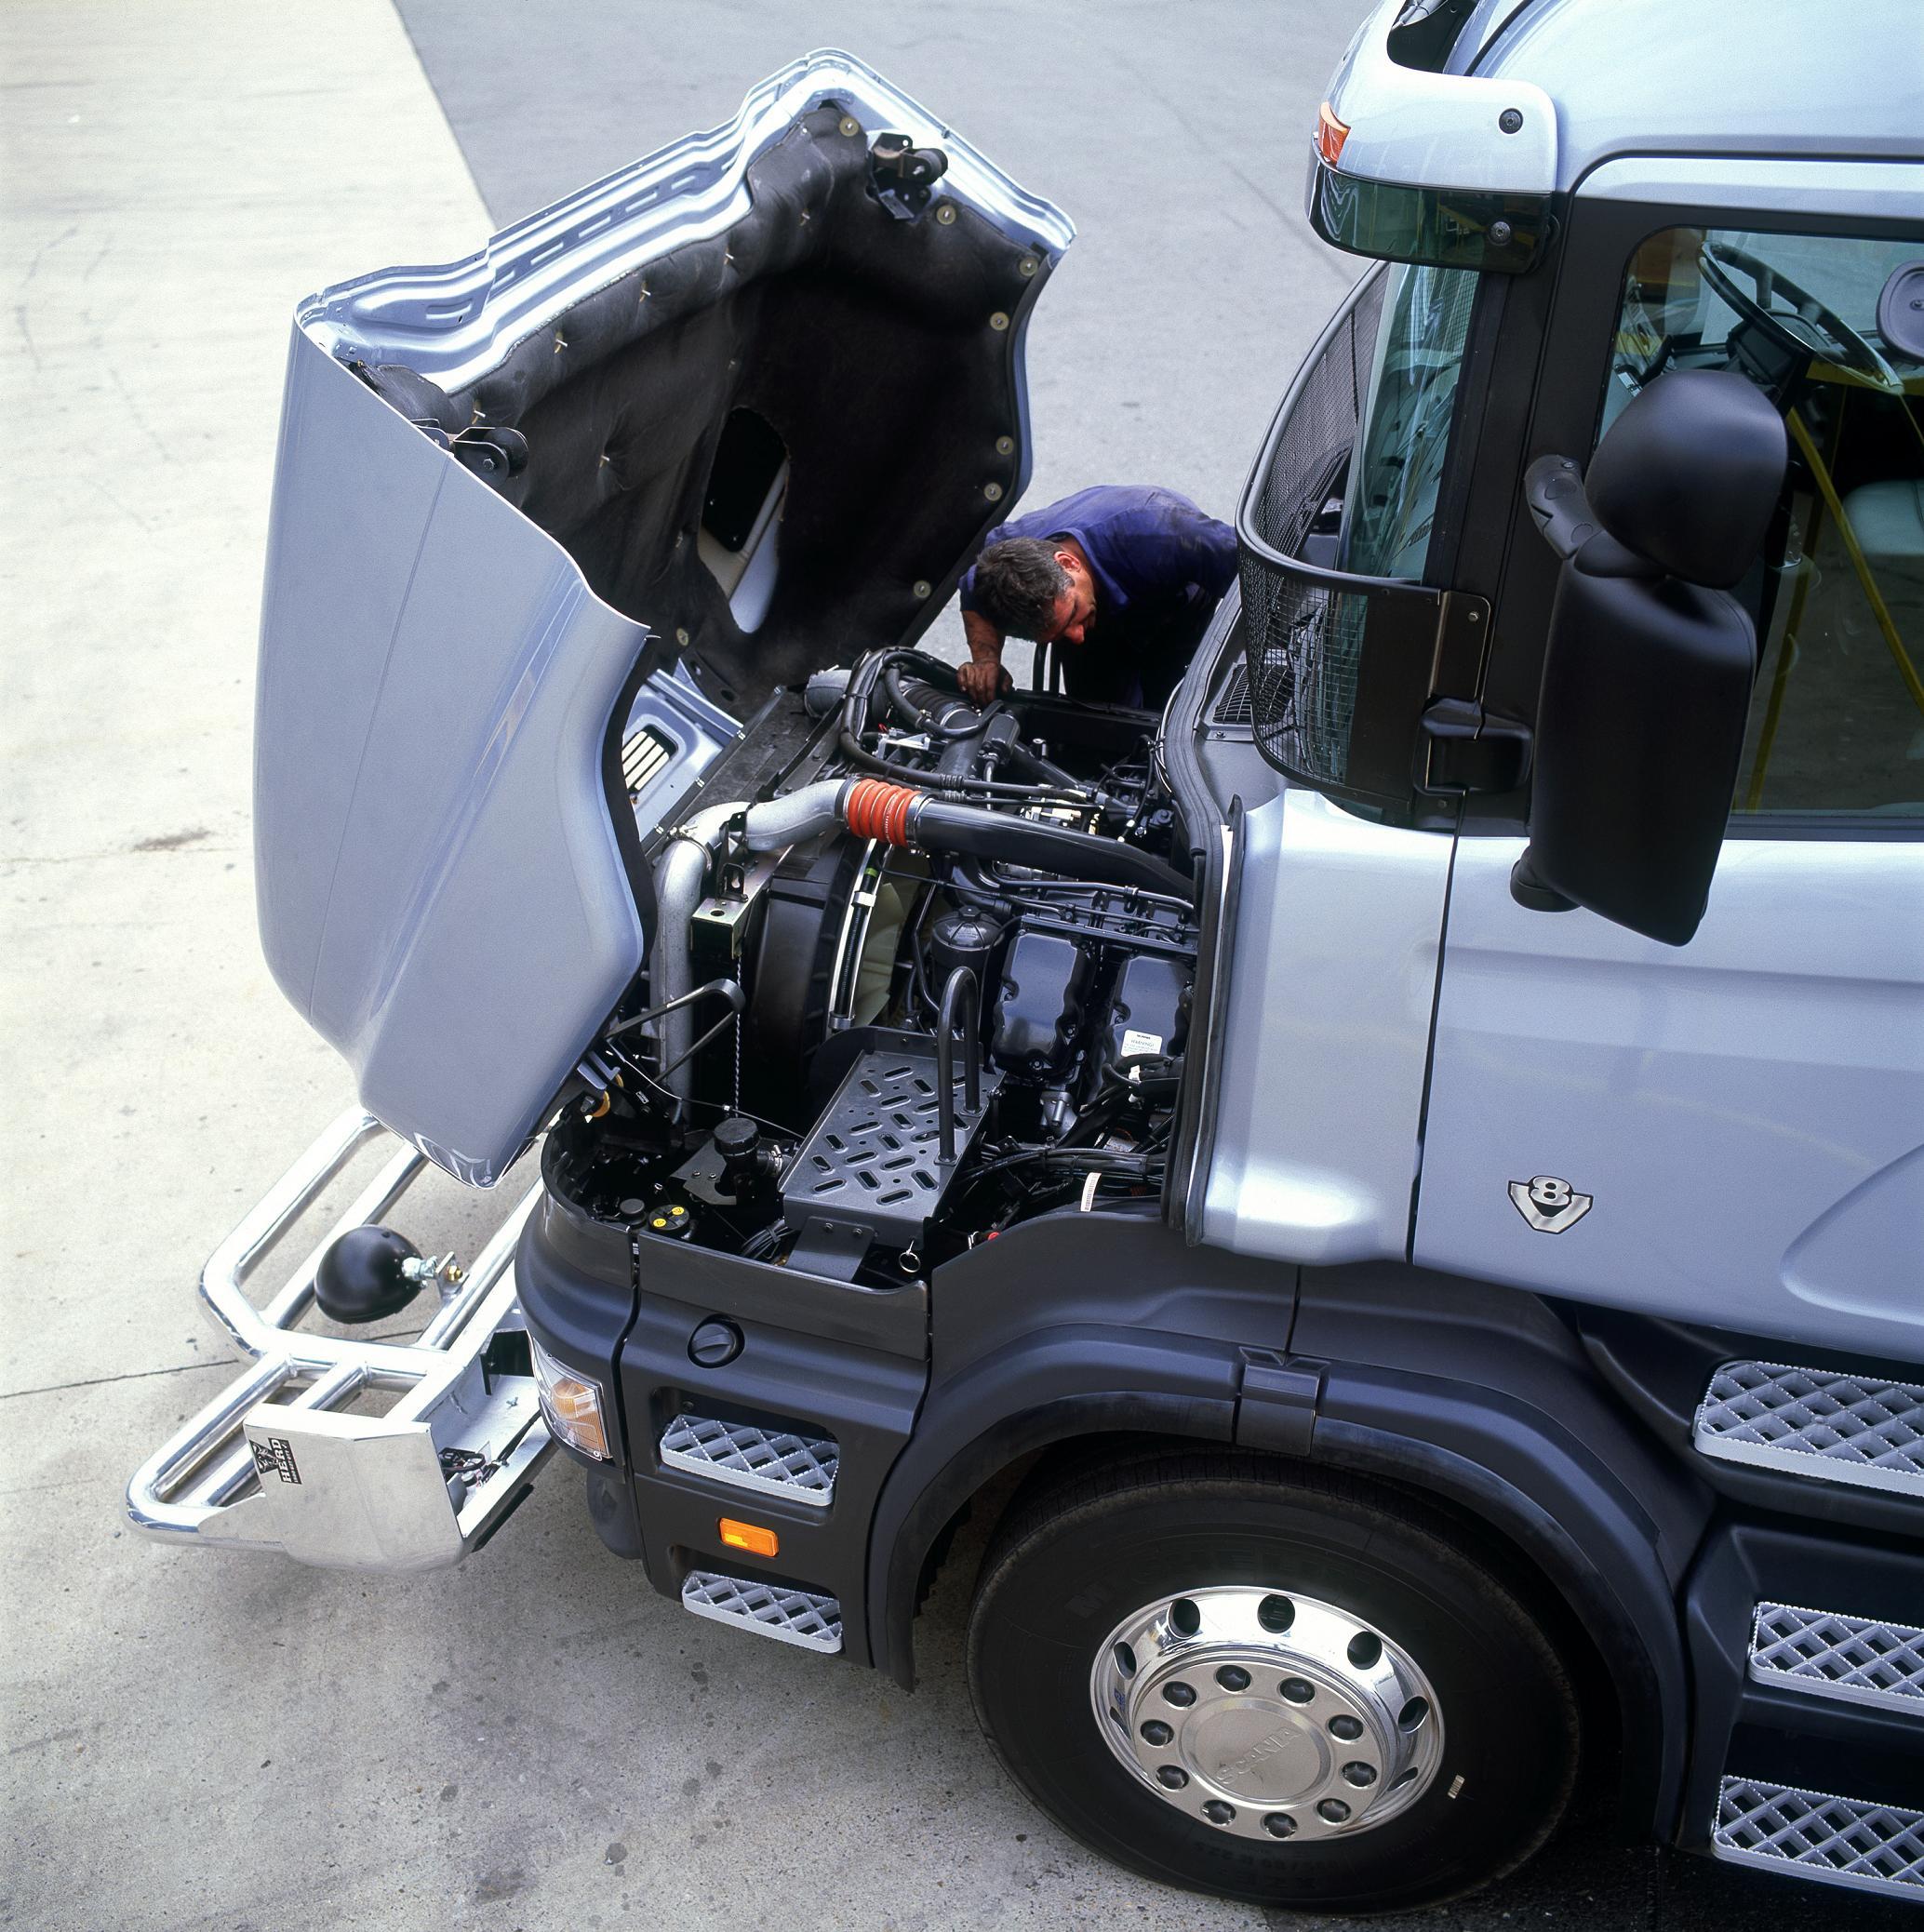 Caterham R620: Purple Scania 530 Truck Desktop Mac Hd Wallpaper Car Tuning